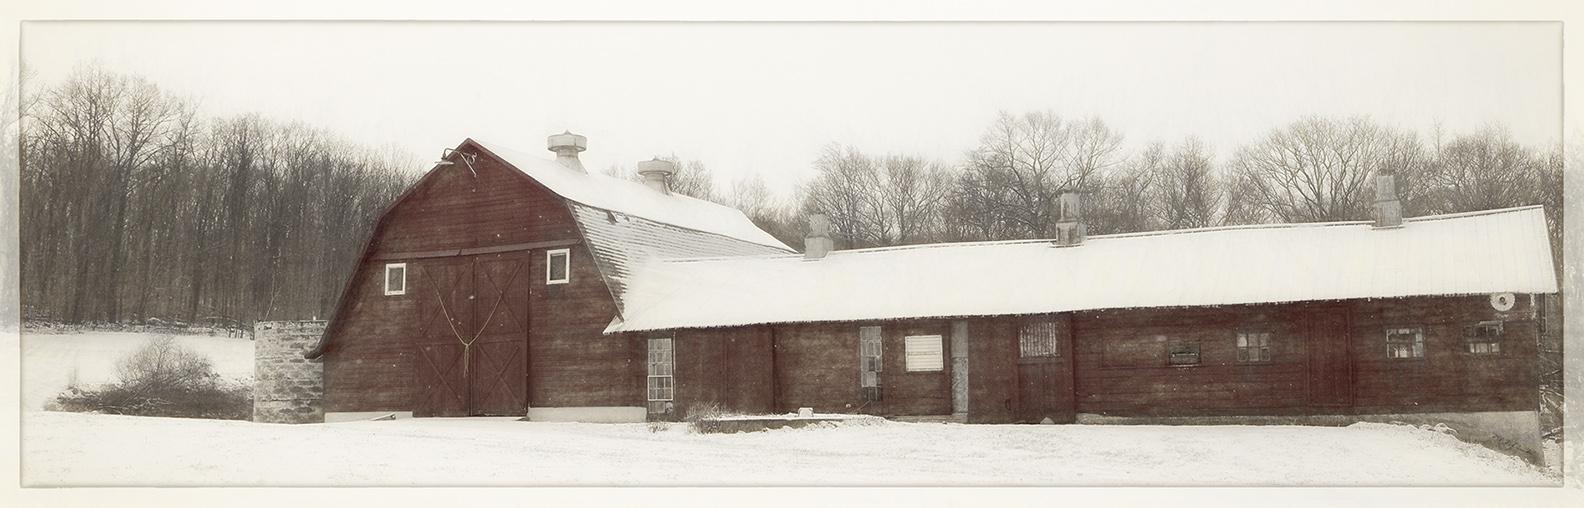 A Quiet Winter Day II